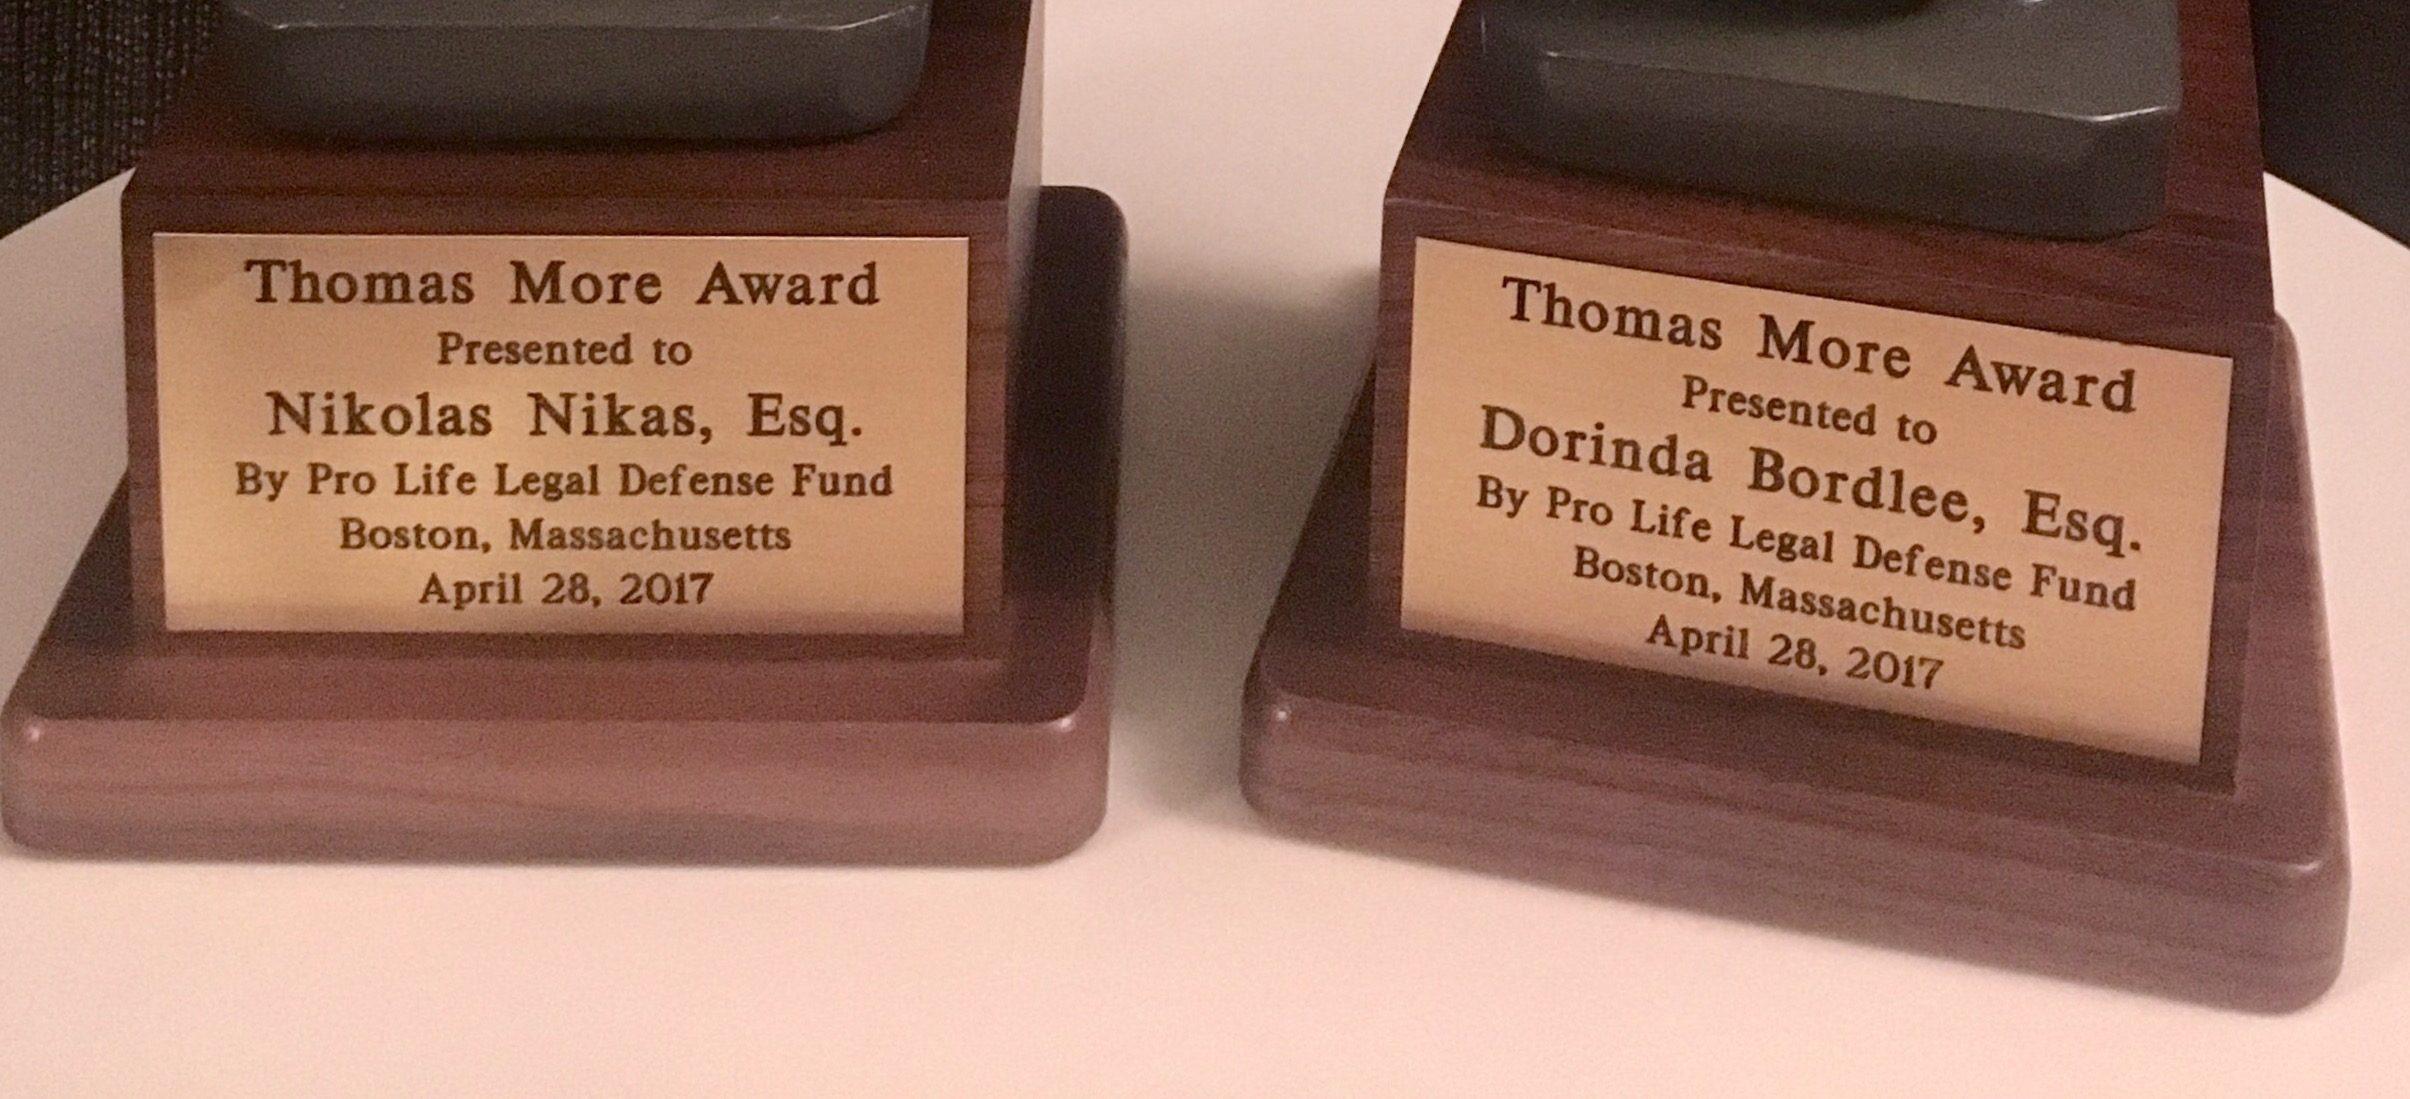 Thomas More Award Granted to BDF Co-Founders